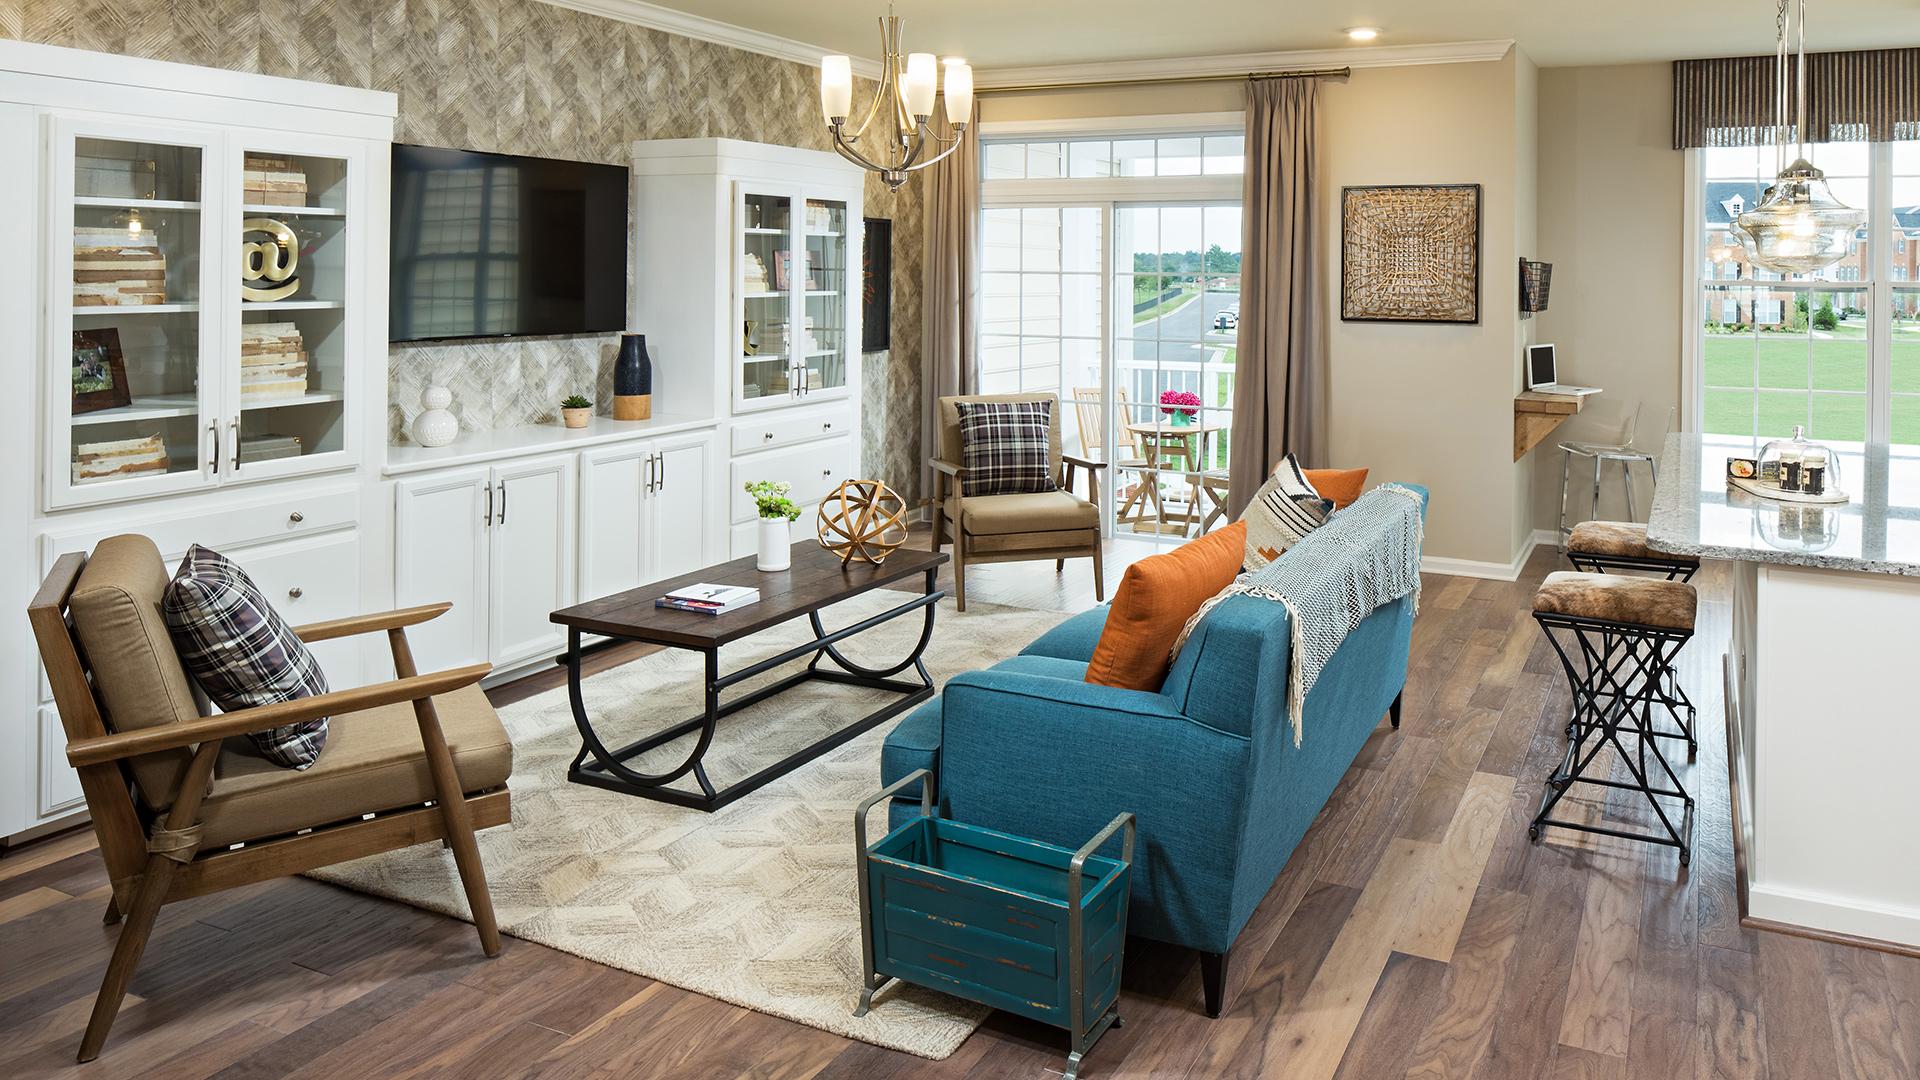 Loudoun Valley - The Ridges Quick Delivery Home - Worthington on riley home plan, ashby home plan, breckenridge home plan,